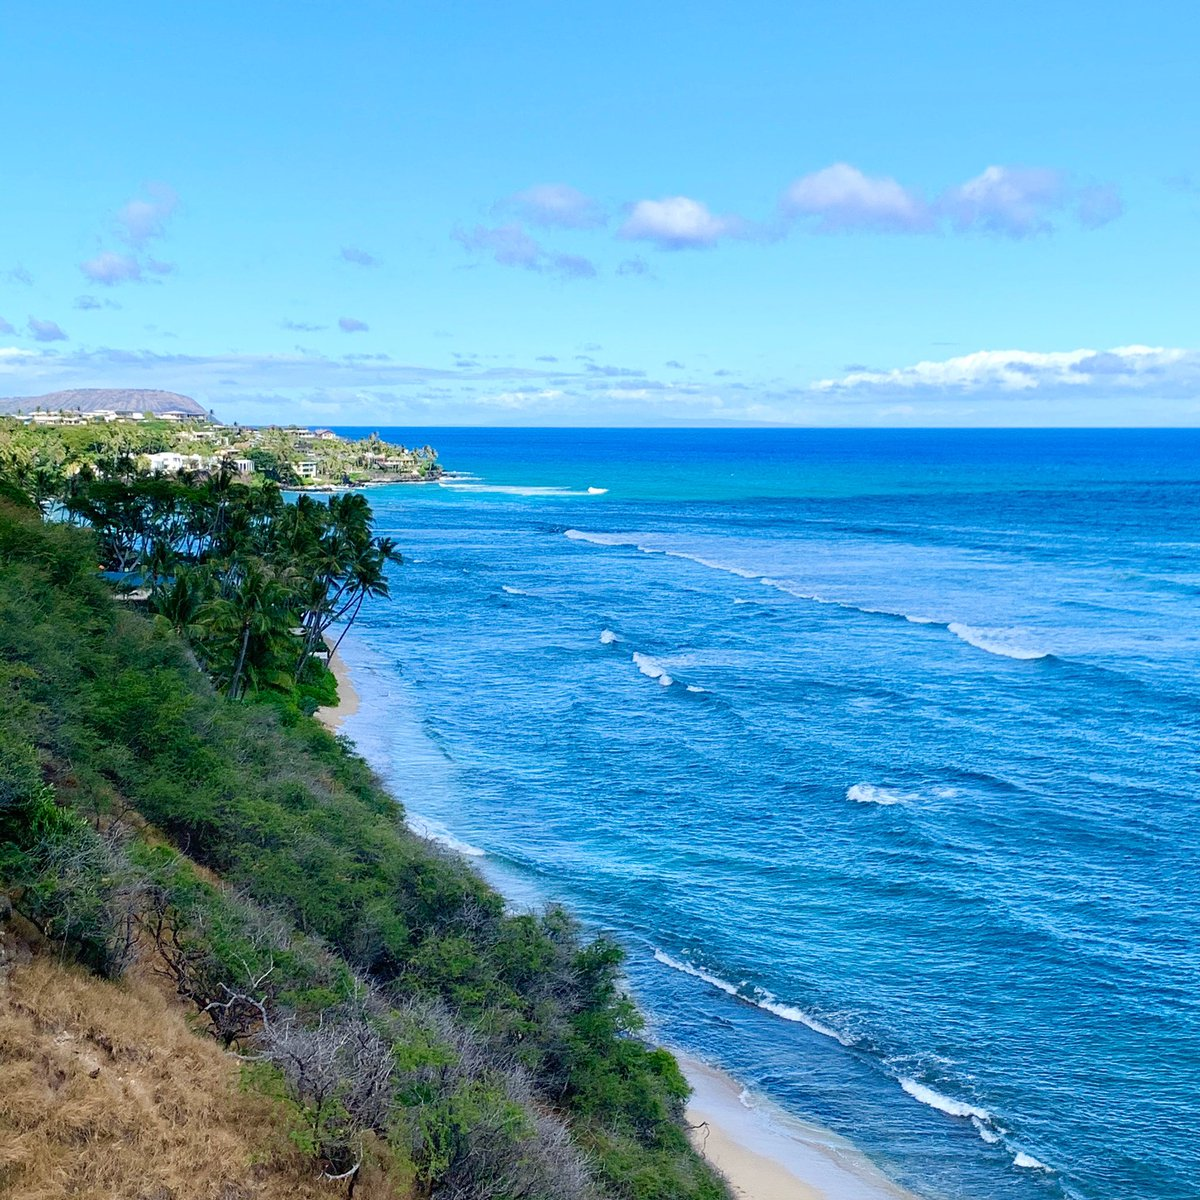 💙💚🌏💚💙  #islandview #oceanblue #diamondheadbeach #hawaiilife #hawaii #hilife #hawaiiliving #lovehawaii #surf #surfing #surflife #beachlife #beachgirl #islandlife #aloha #luckywelivehawaii #サーフィン #ハワイ #ビーチライフ #ハワイライフ #ハワイ暮らし #海のある生活 #島暮らし https://t.co/3qvm30WAK8